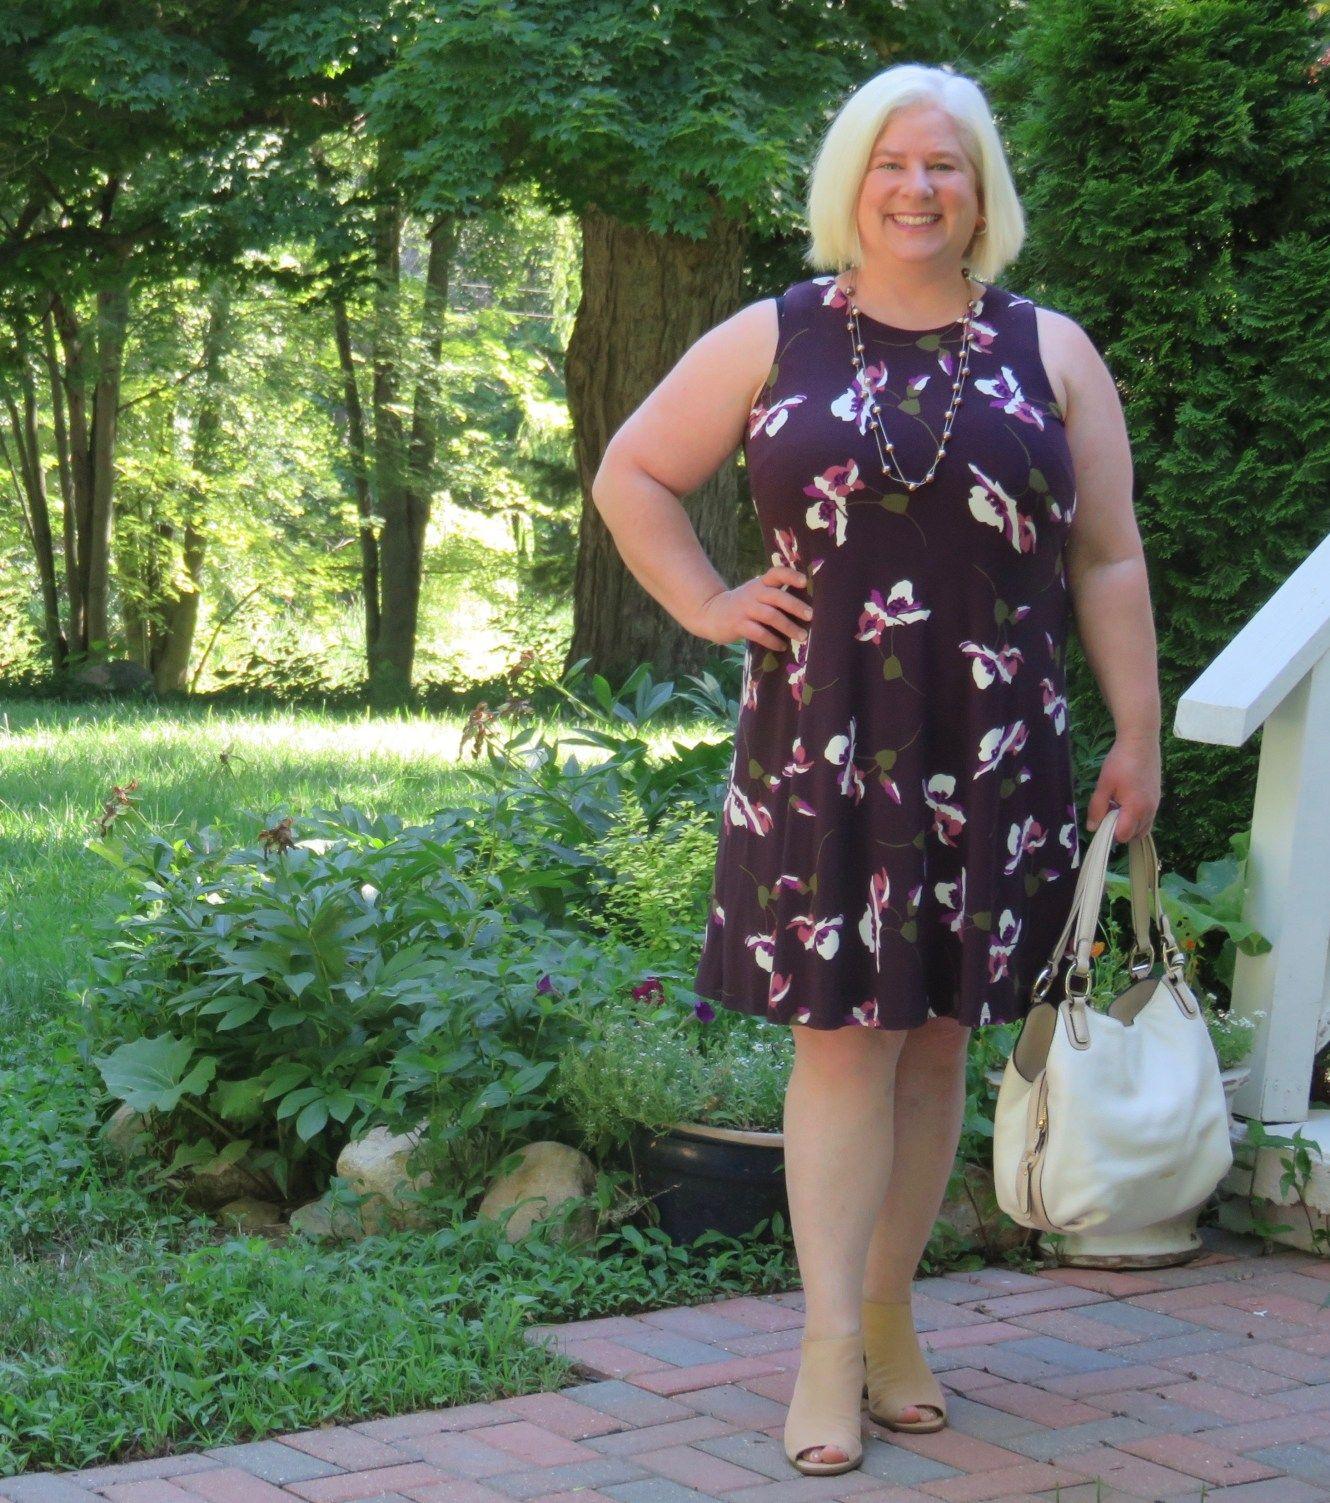 Best Summer Dress For Apple Shaped Women Whenthegirlsrule Com Best Summer Dresses Dresses For Apple Shape Summer Dresses [ 1503 x 1330 Pixel ]